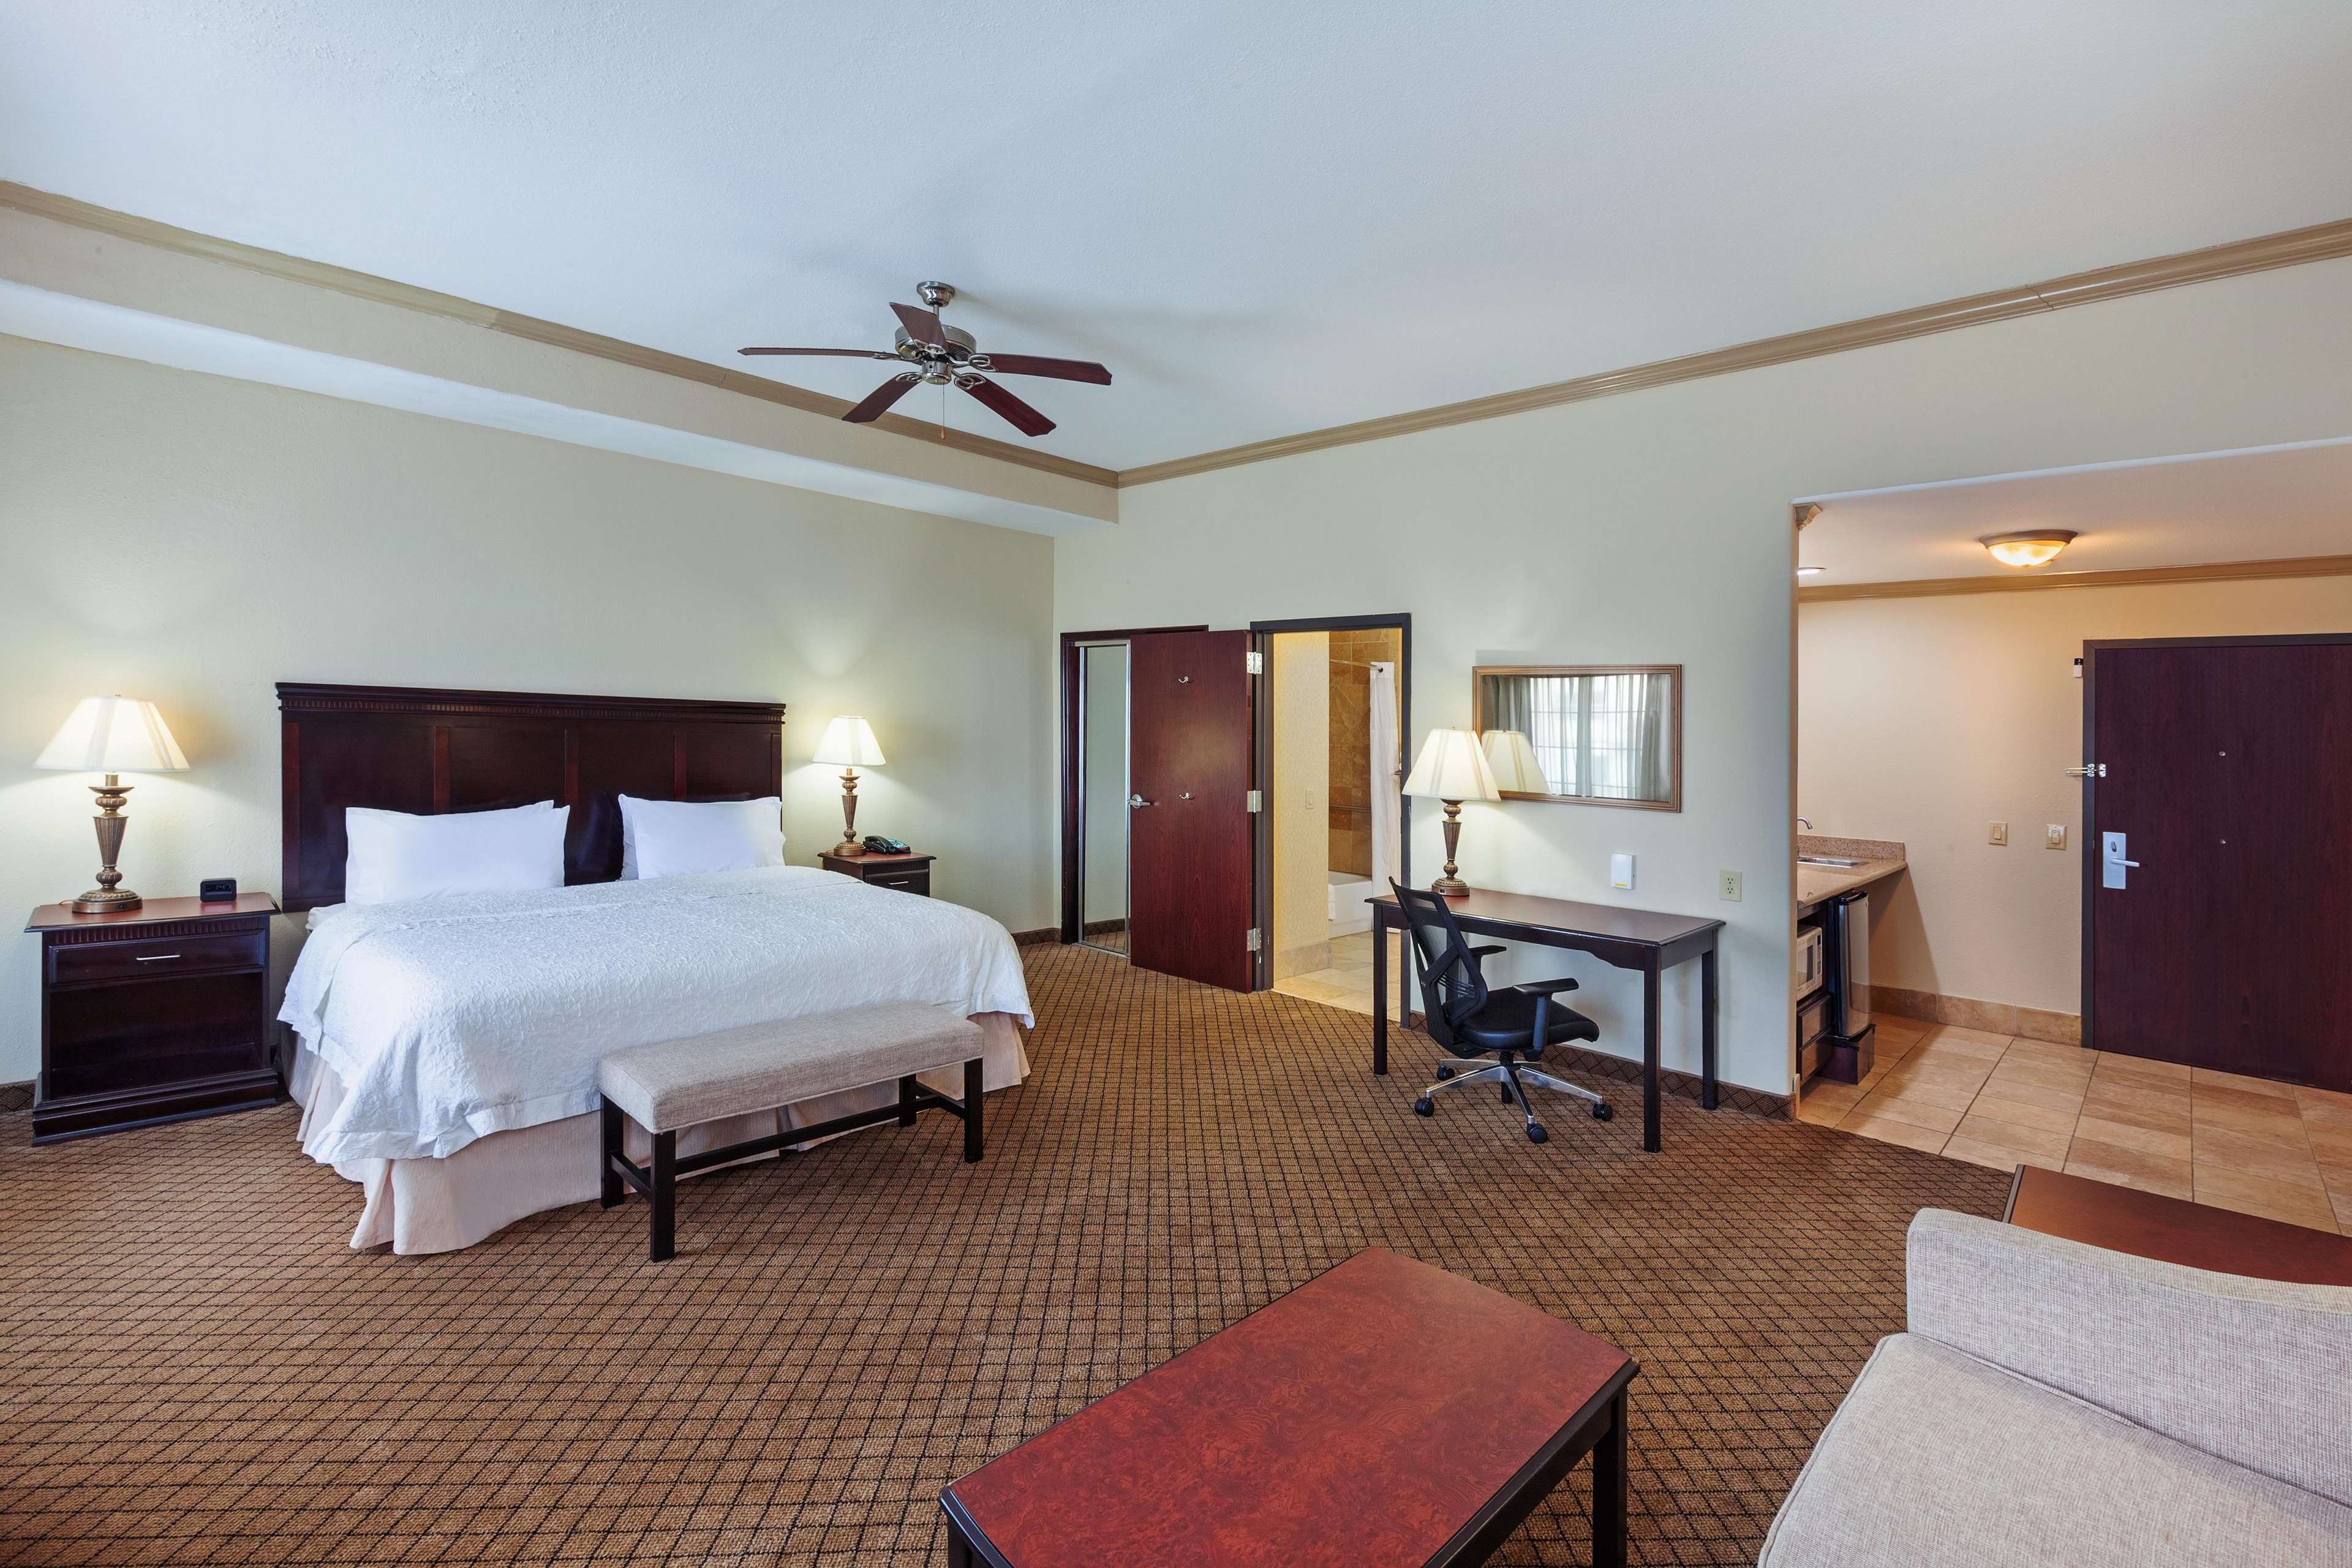 Hampton Inn & Suites Galveston image 25